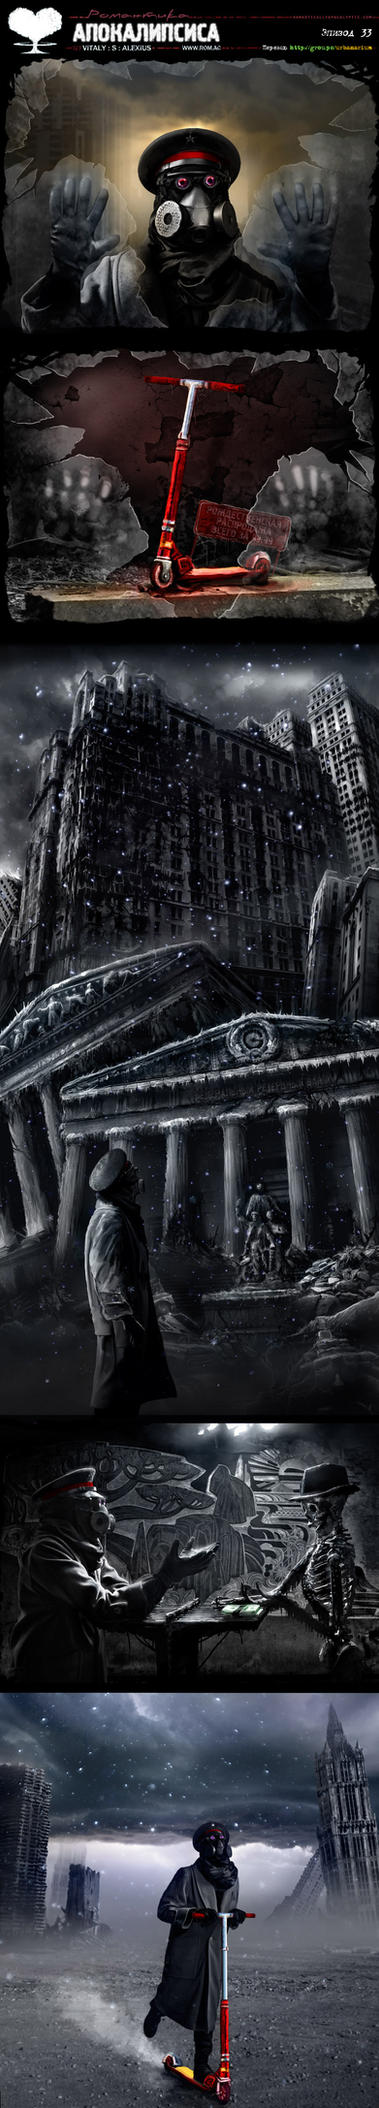 Romantically Apocalyptic 33 by Urbanarium